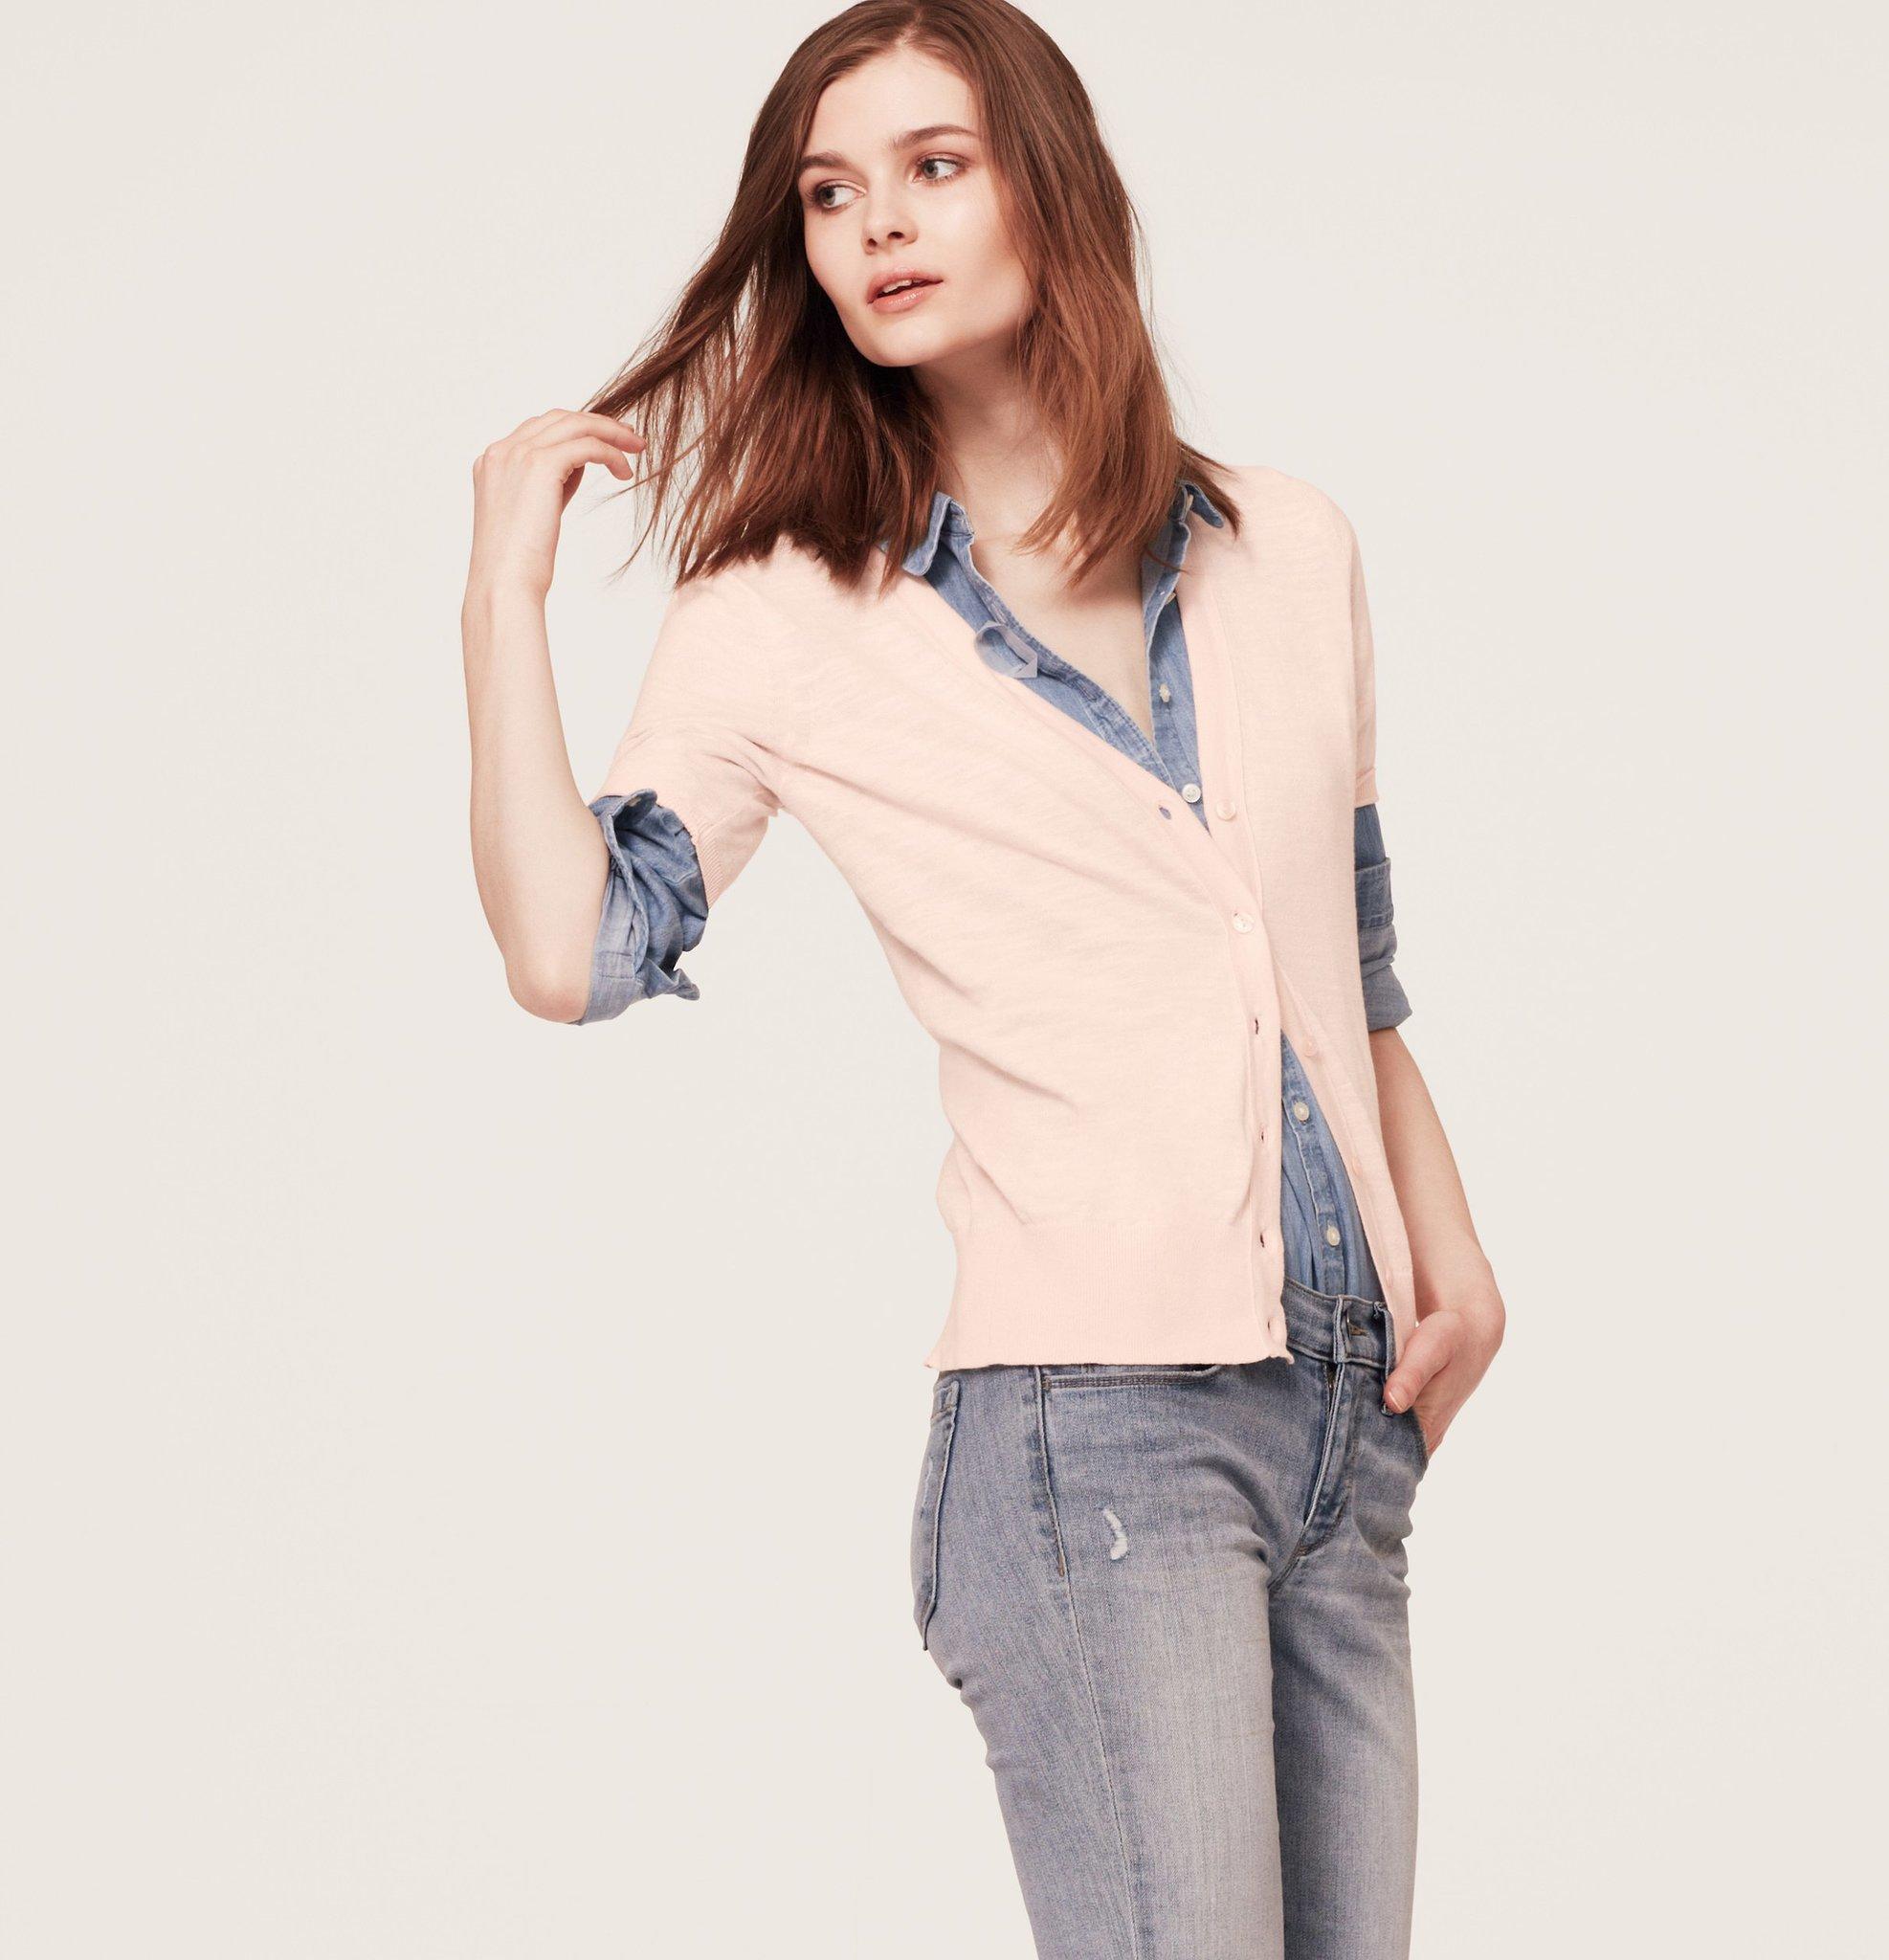 Loft Slubbed Cotton Short Sleeve Cardigan ($45)